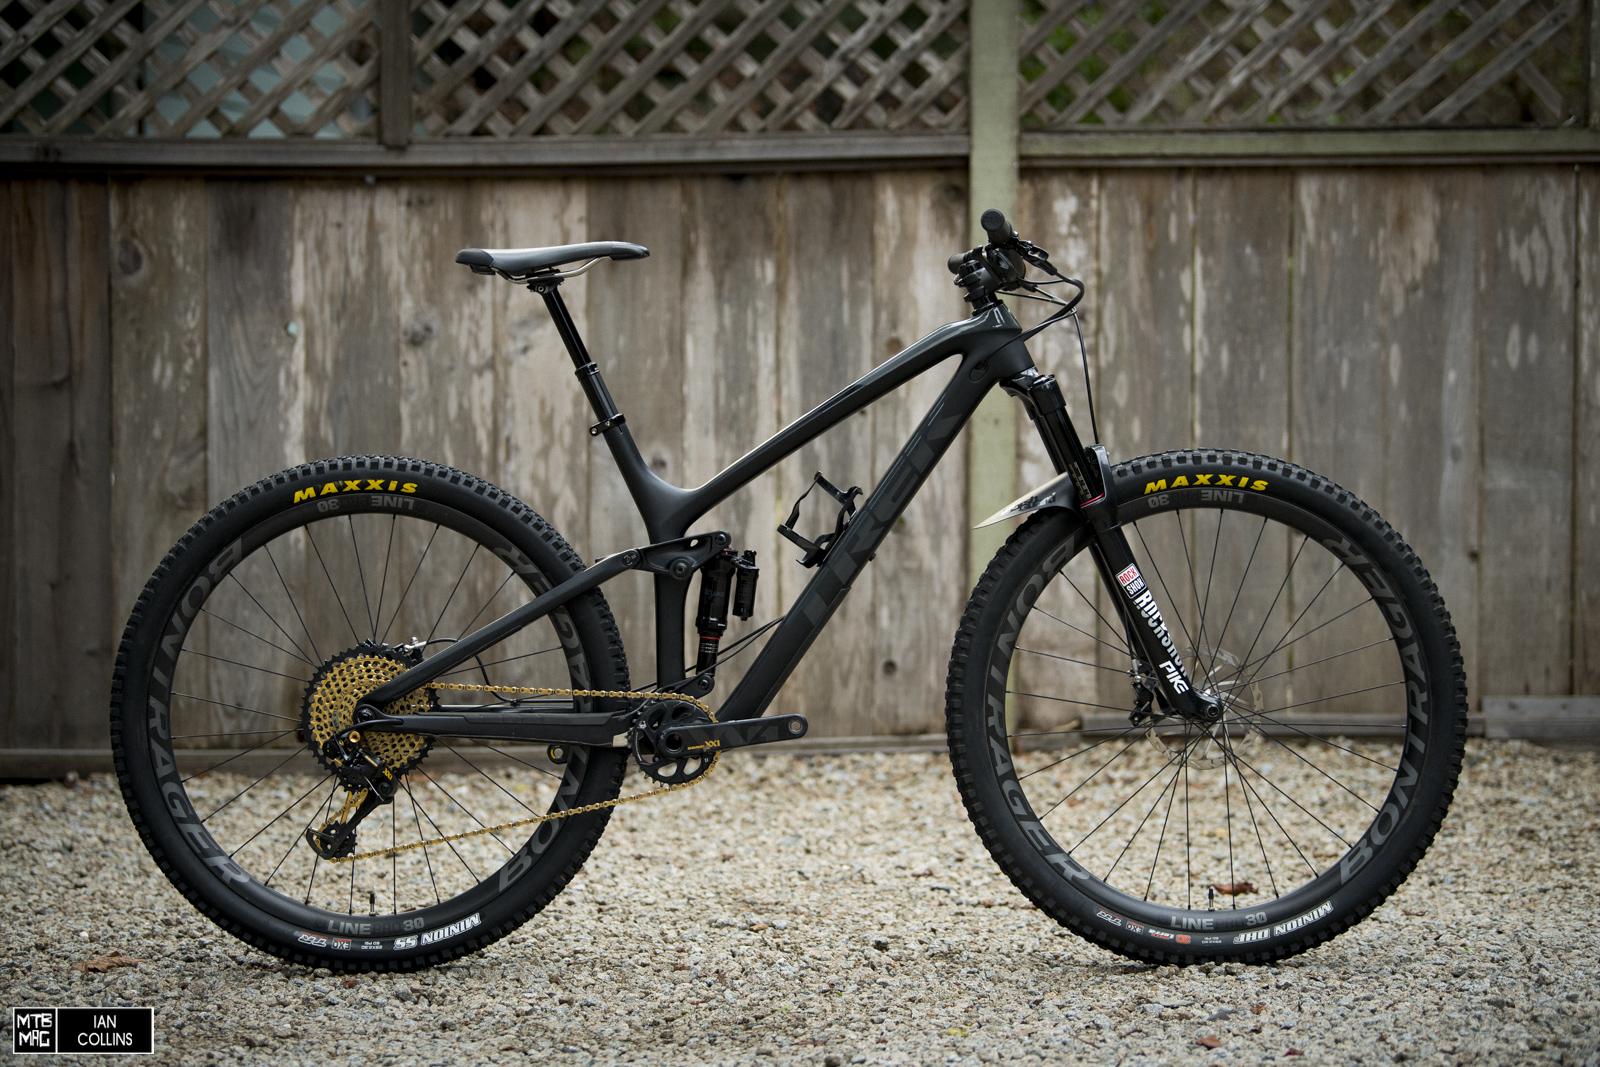 MTB-MAG COM - Mountain Bike Magazine   [Bike Check] Trek